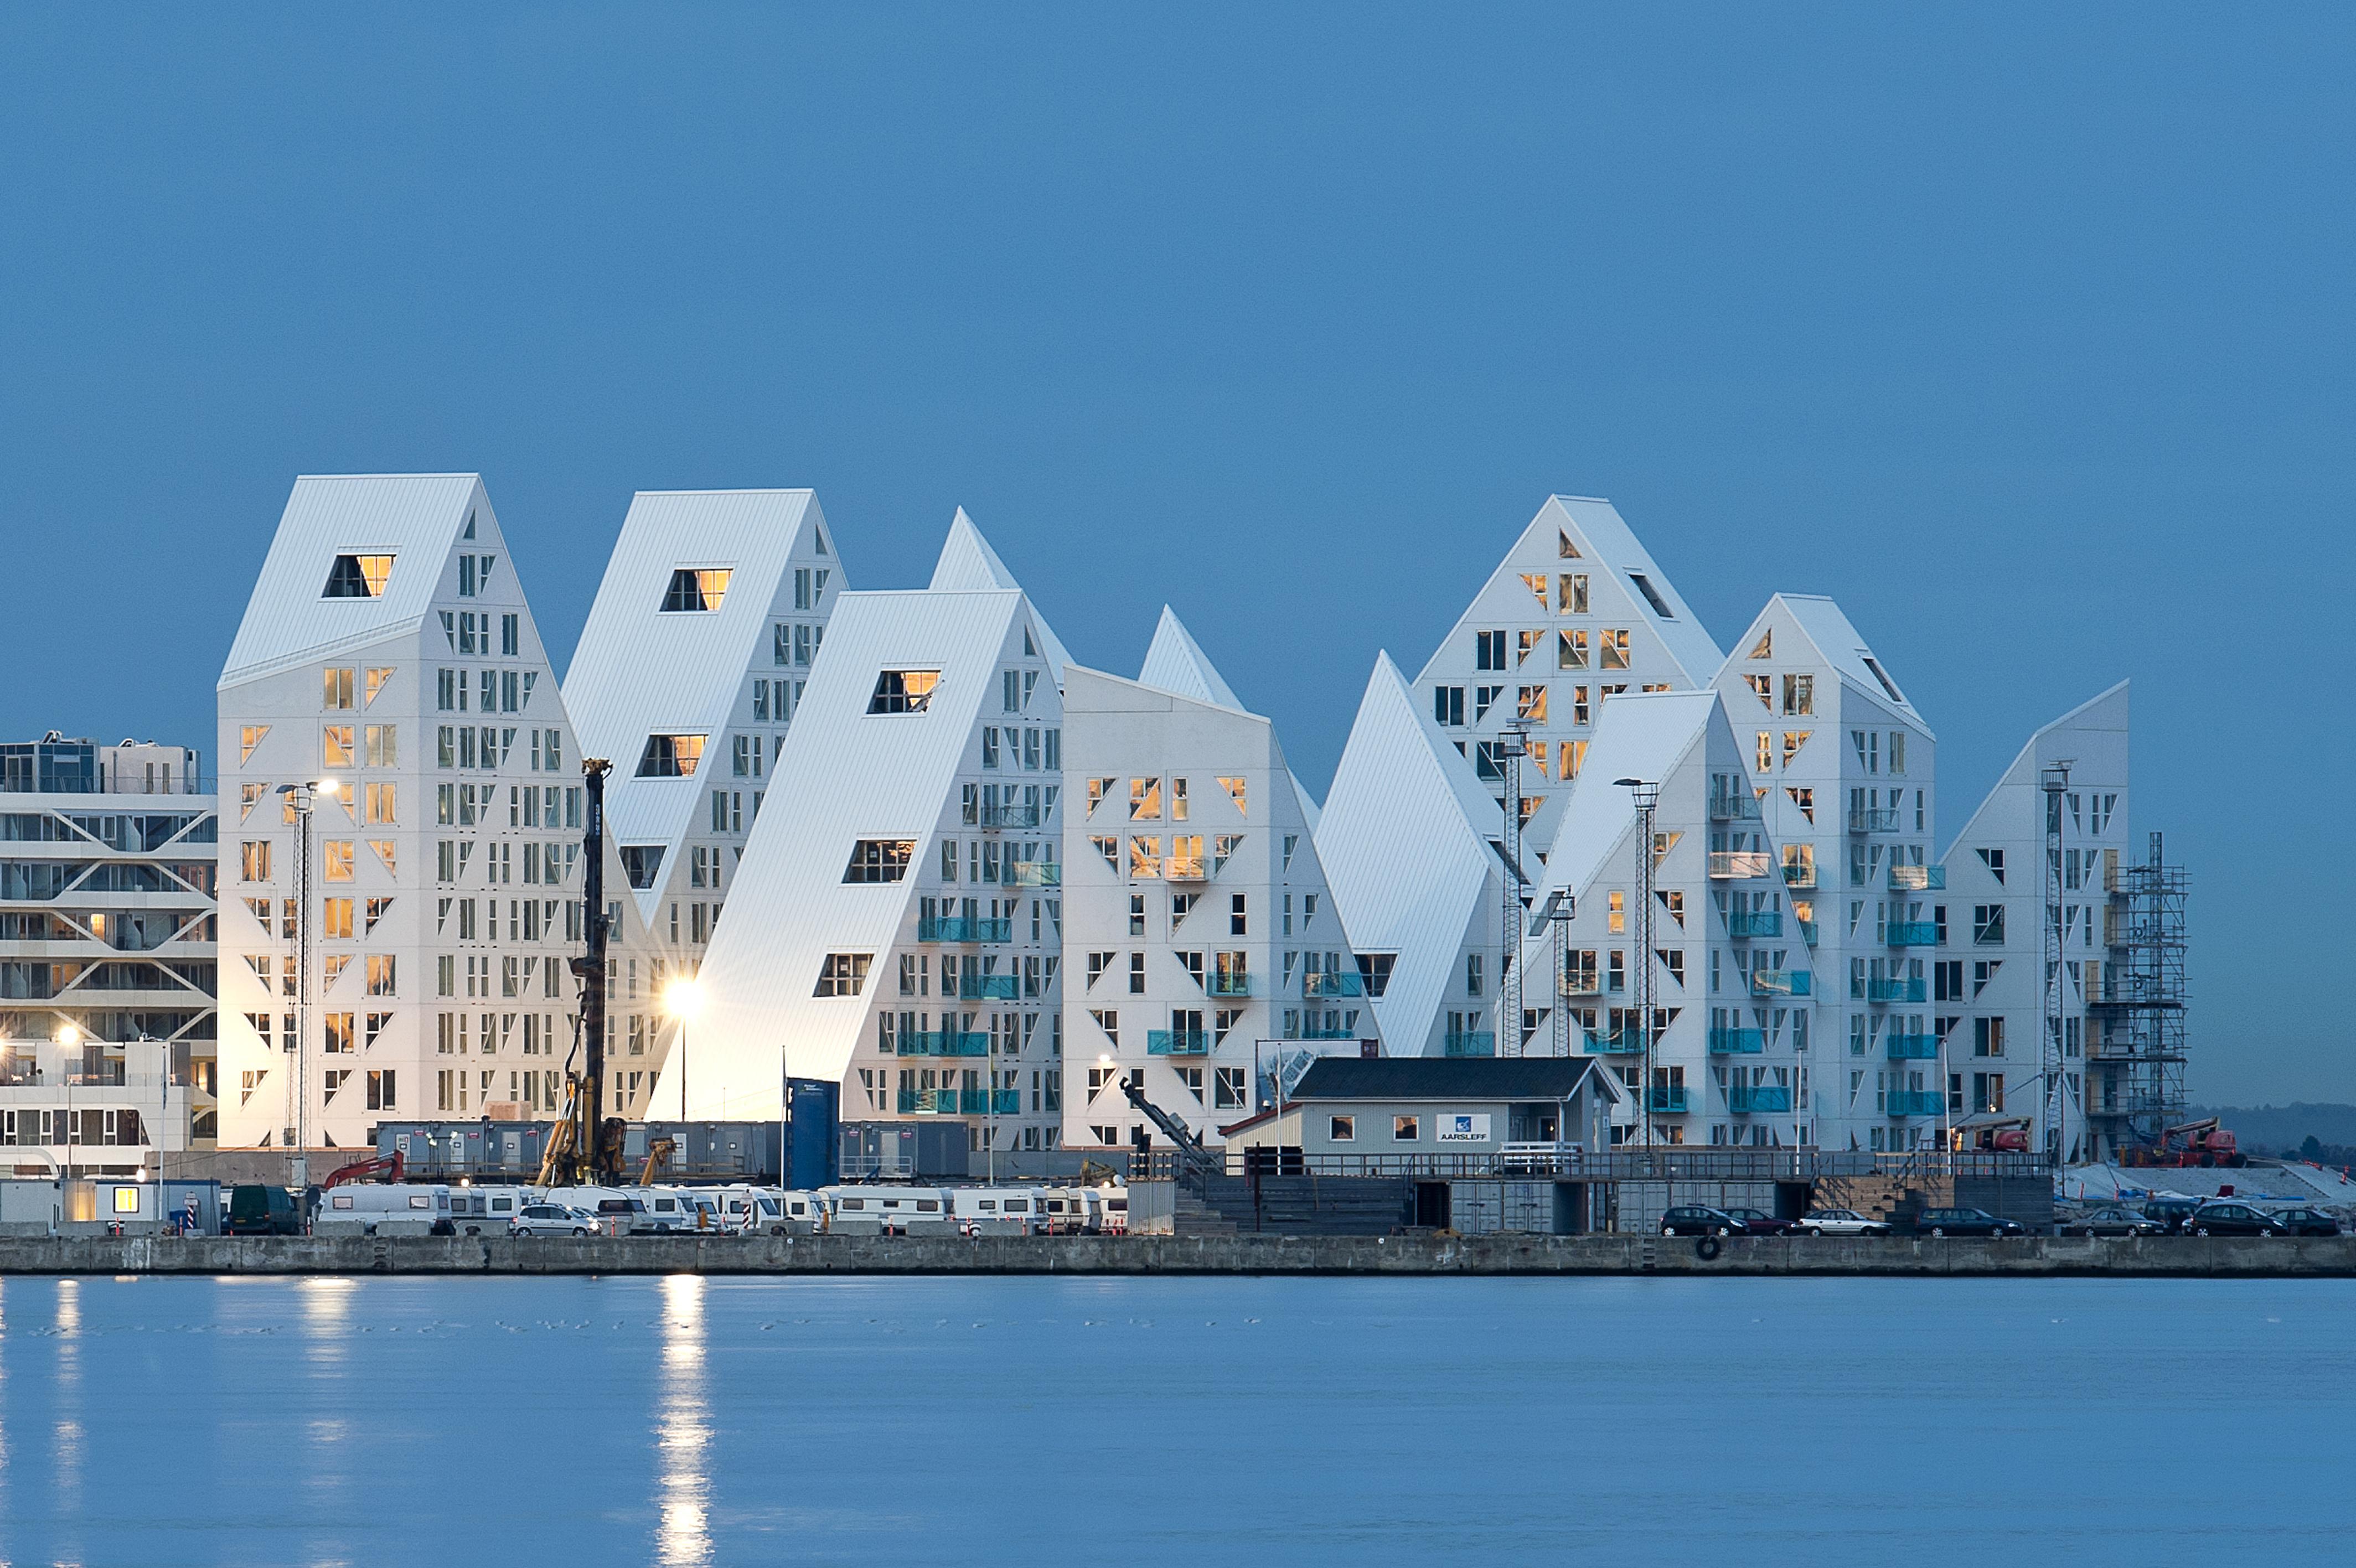 13. Westival Architektury